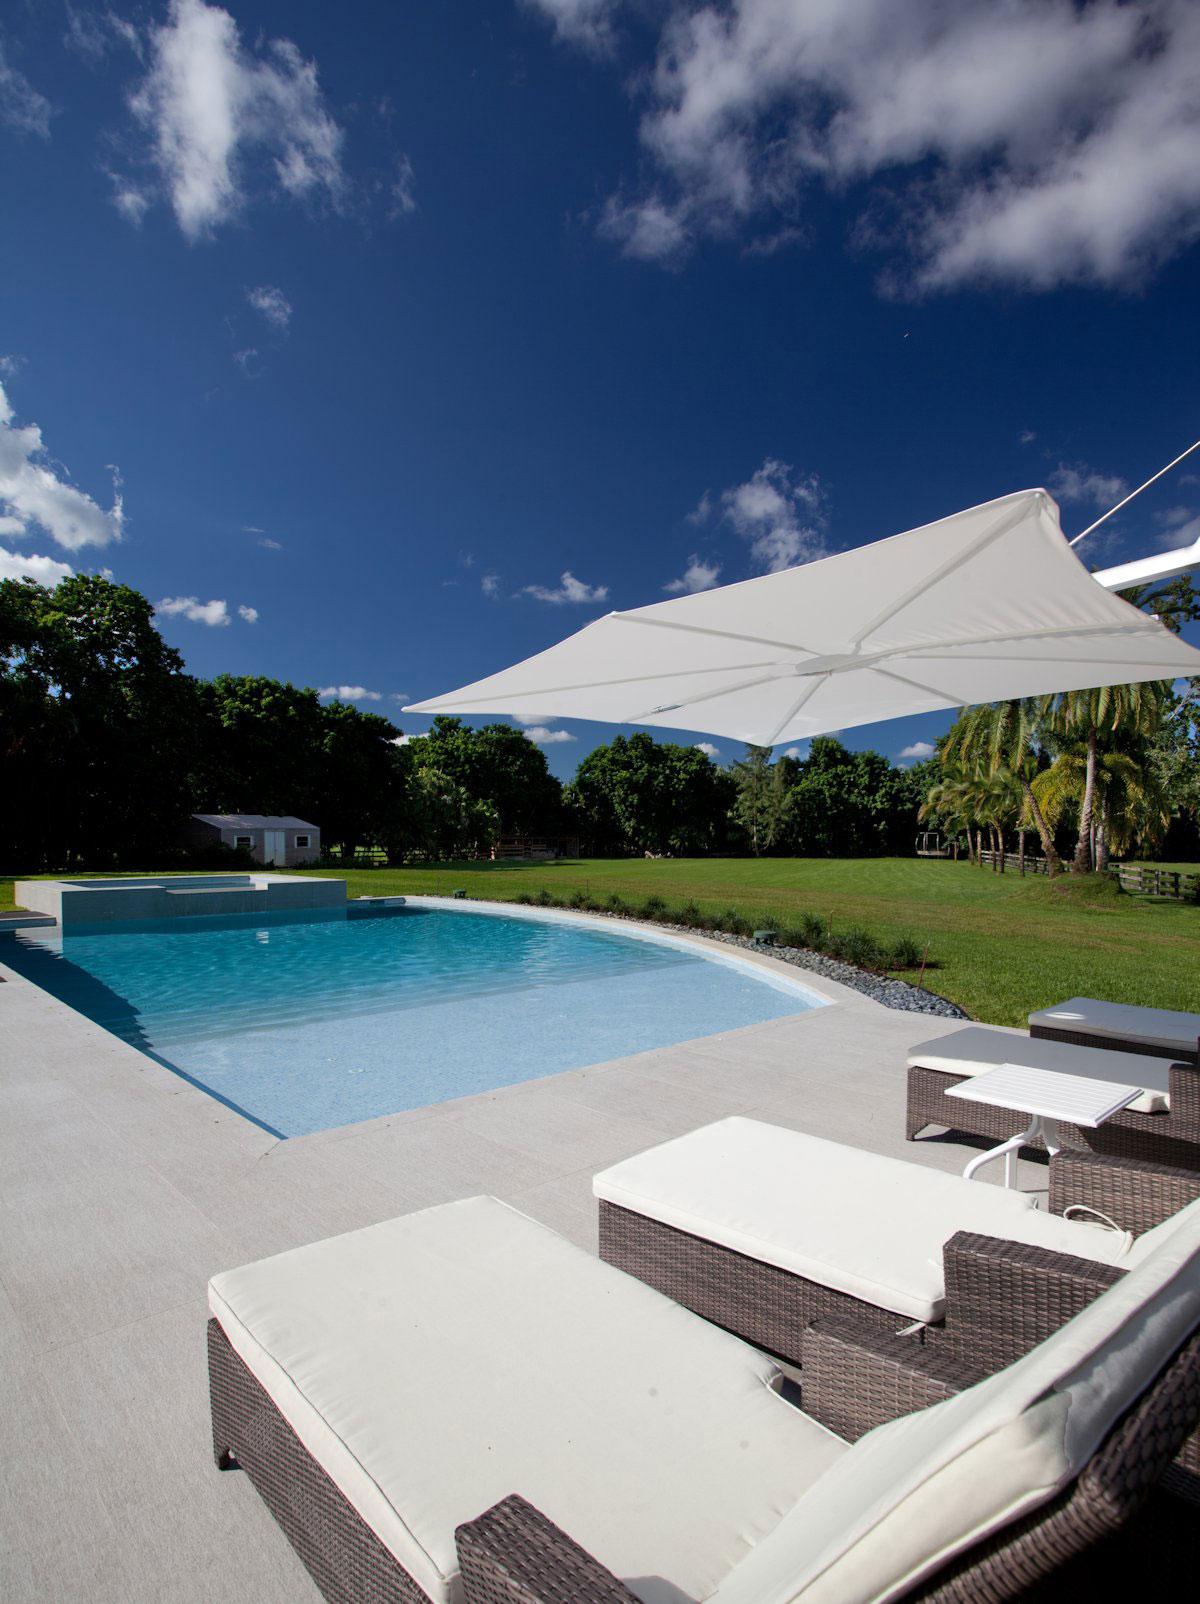 Pool, Garden Furniture, Modern Retreat in Davie, Florida